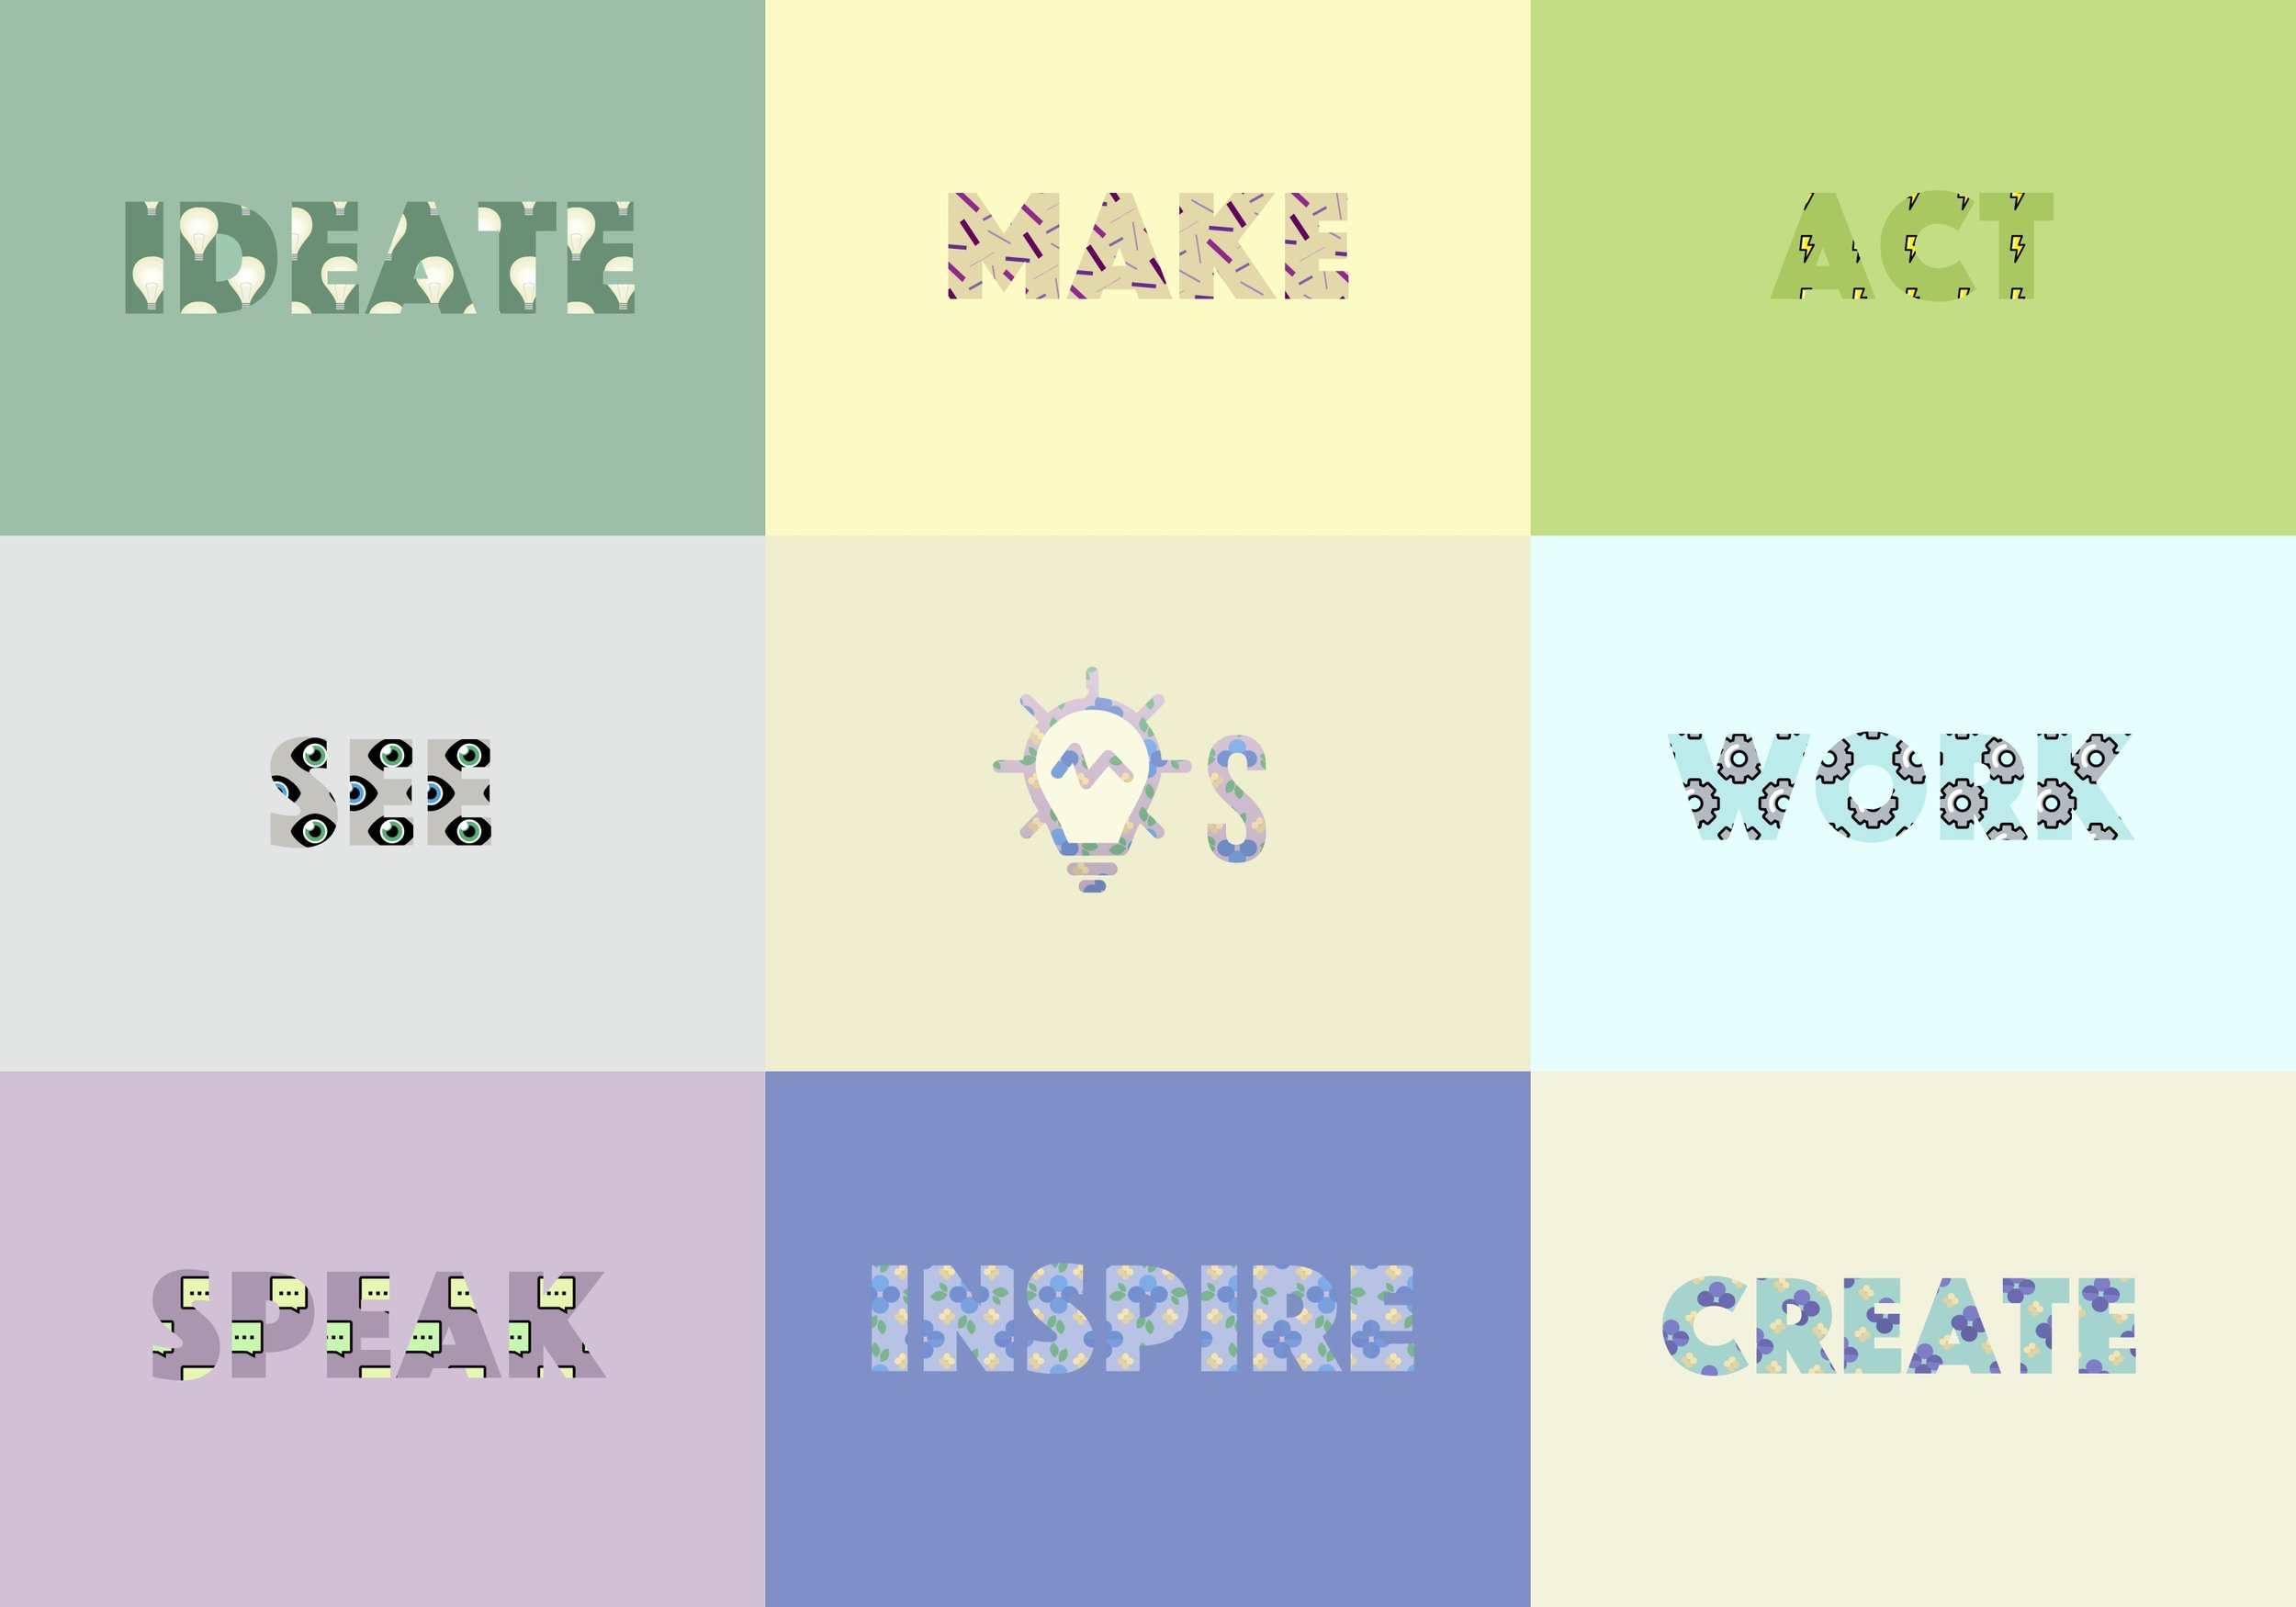 ideate-checker.jpg